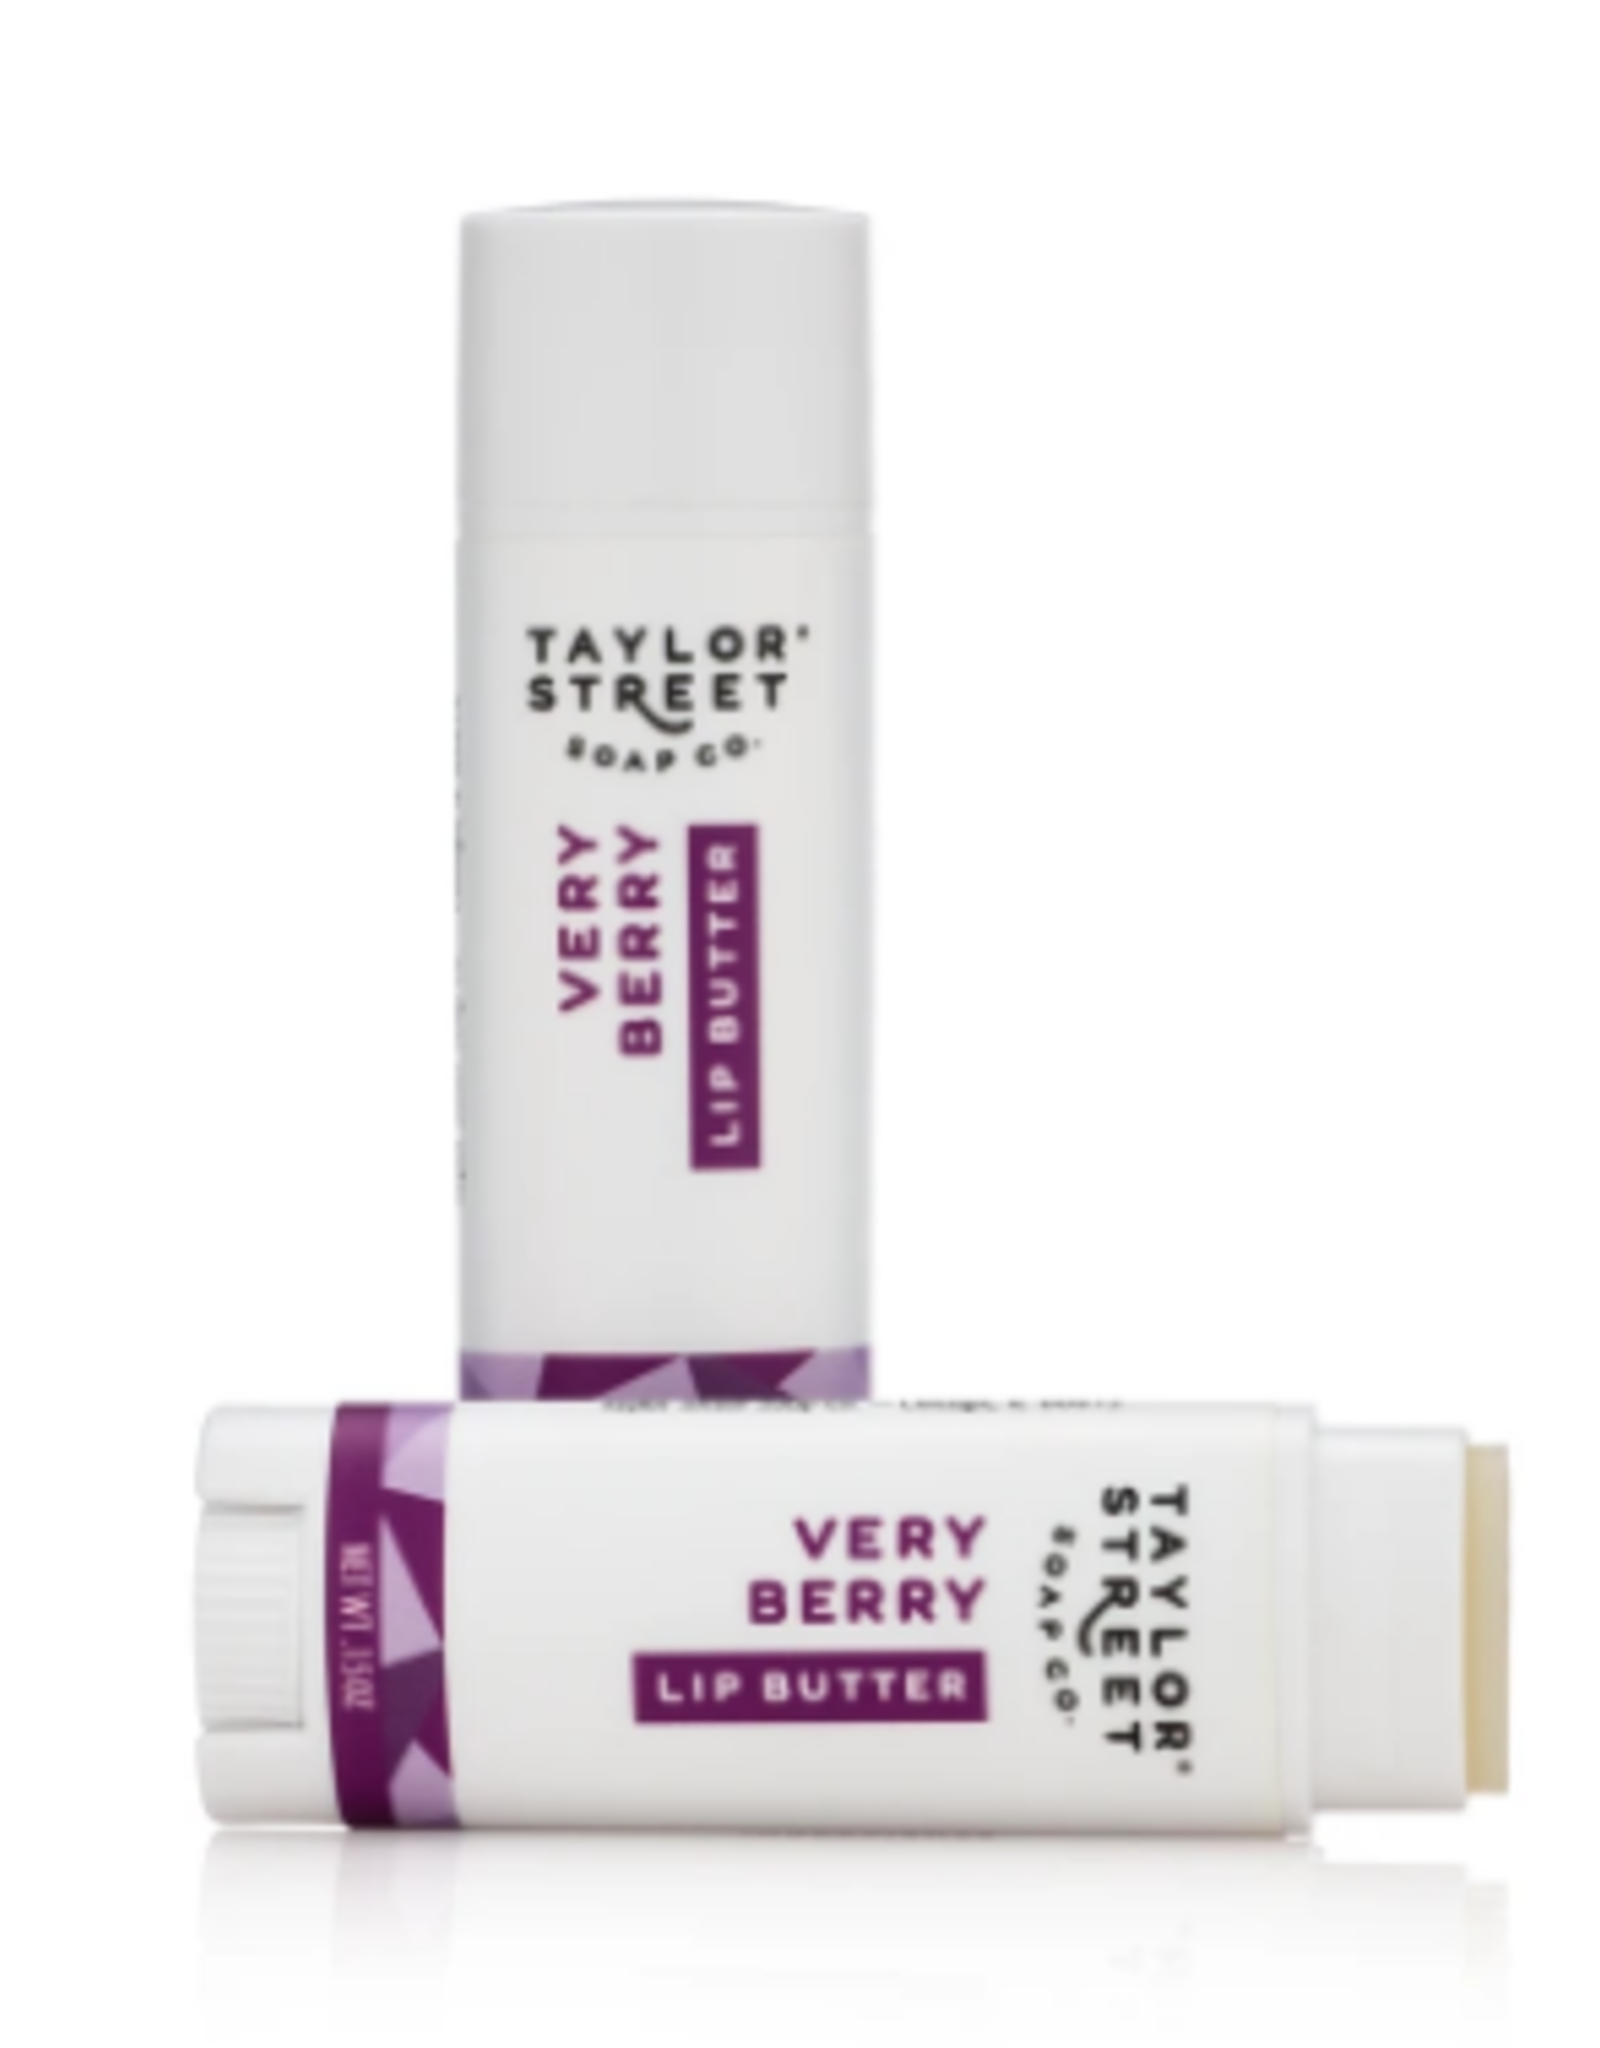 Taylor Street Taylor Street Soap Co.| Lip Balm